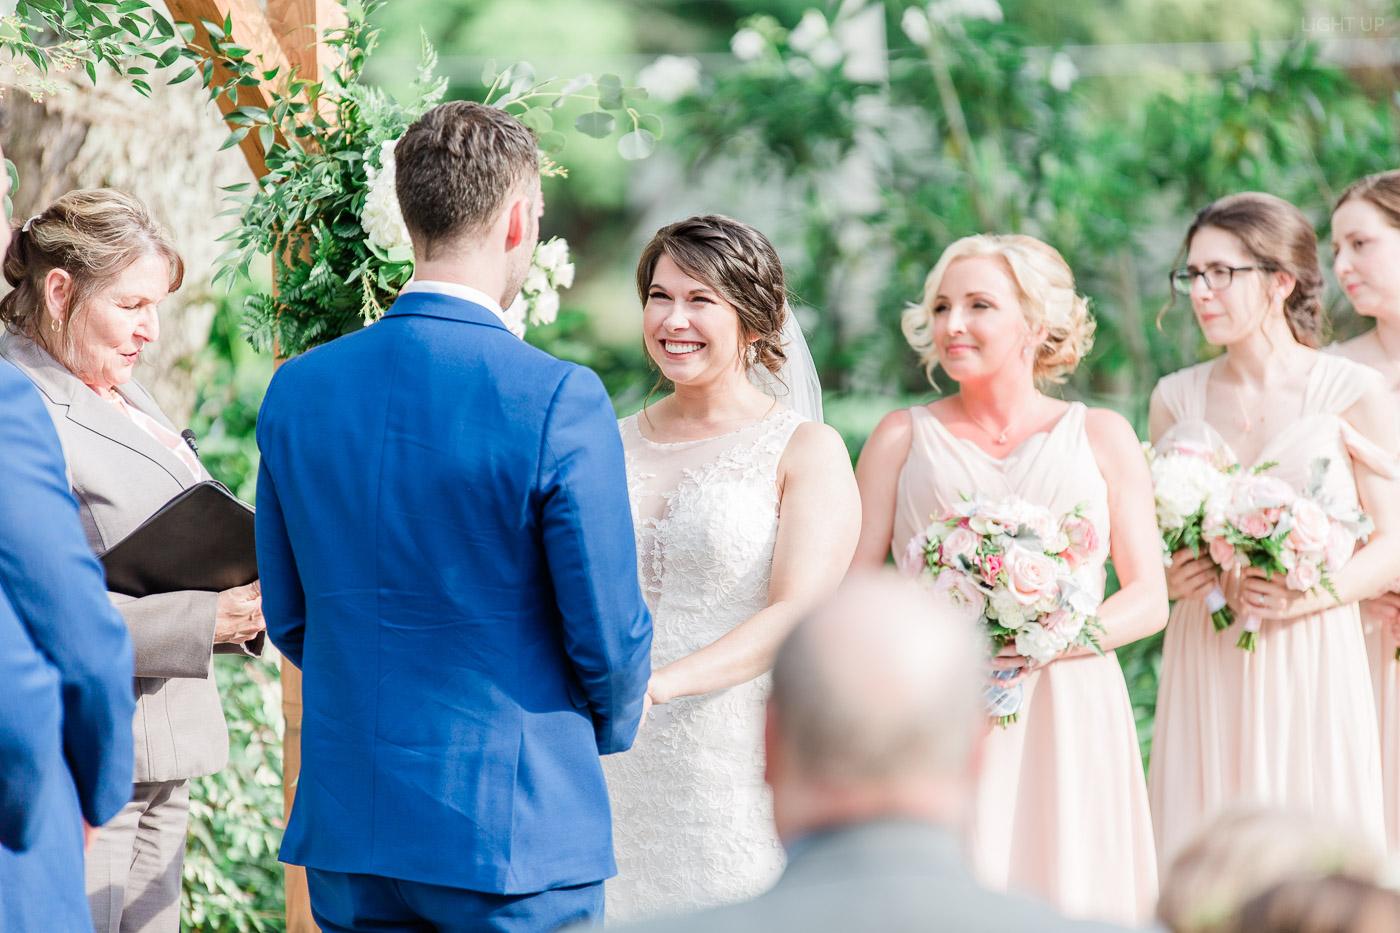 hstoric-dubsdread-wedding-orlando-11.jpg